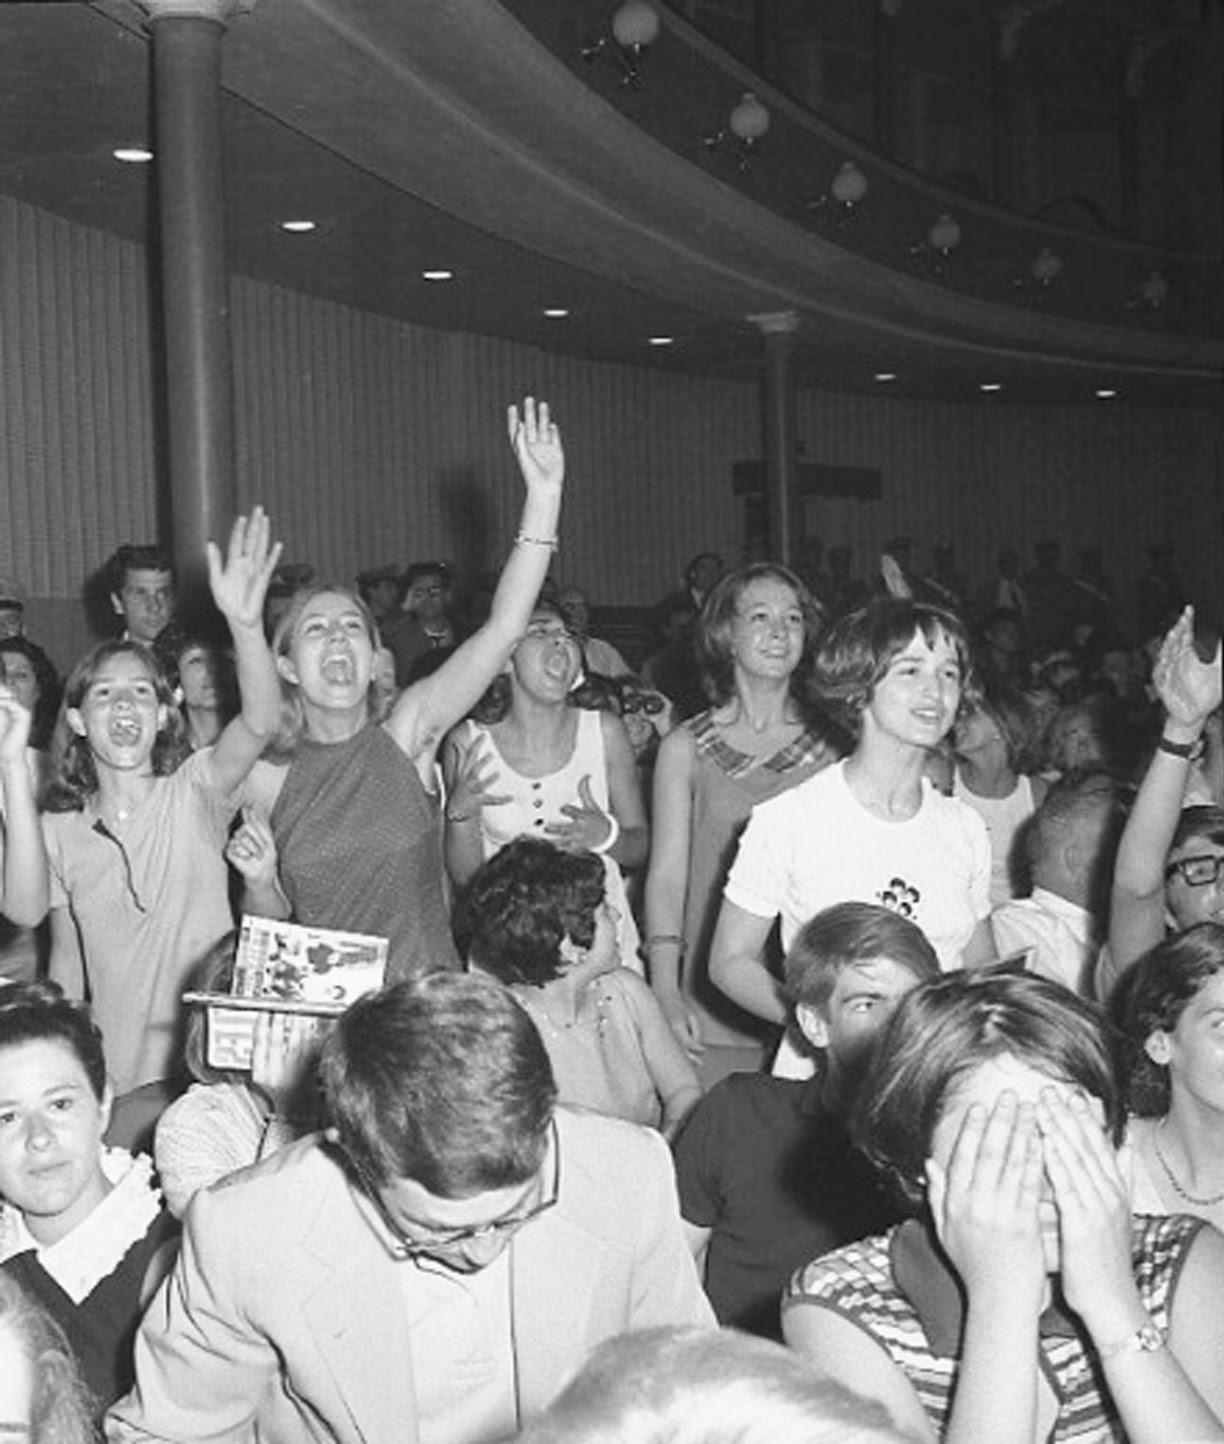 Musicitt giugno 1965 i beatles a roma - Diva futura club ...